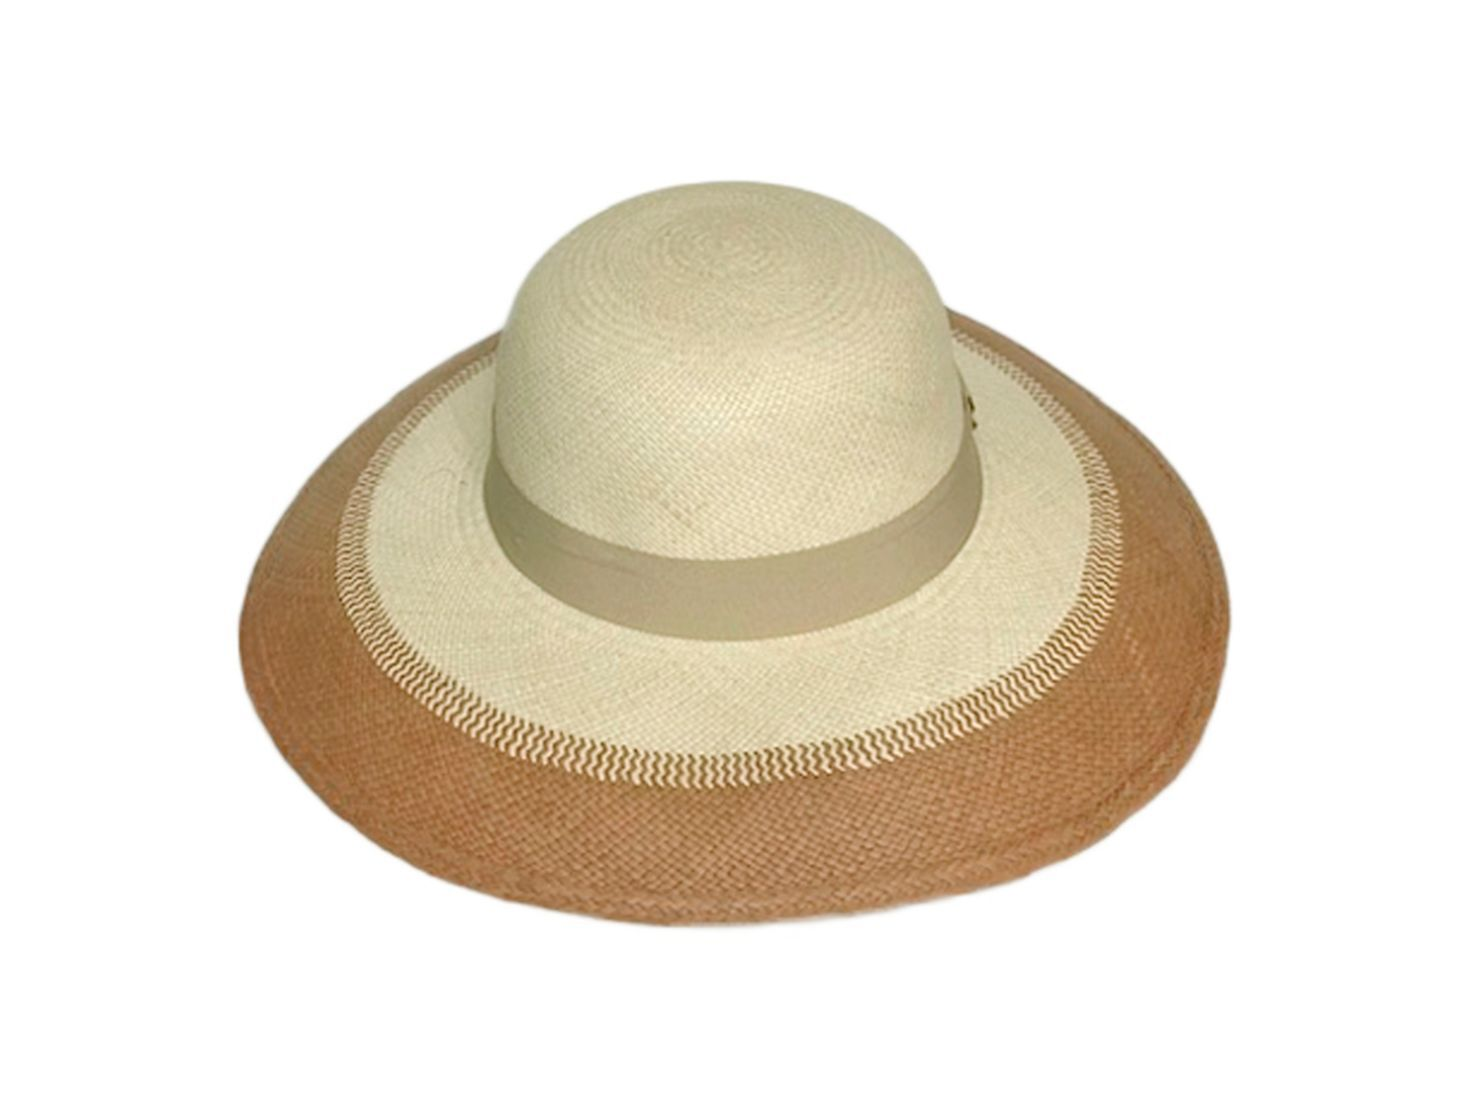 65a6feecd33bf Sombrero Mujer Duo Apitara - Gorros y Sombreros